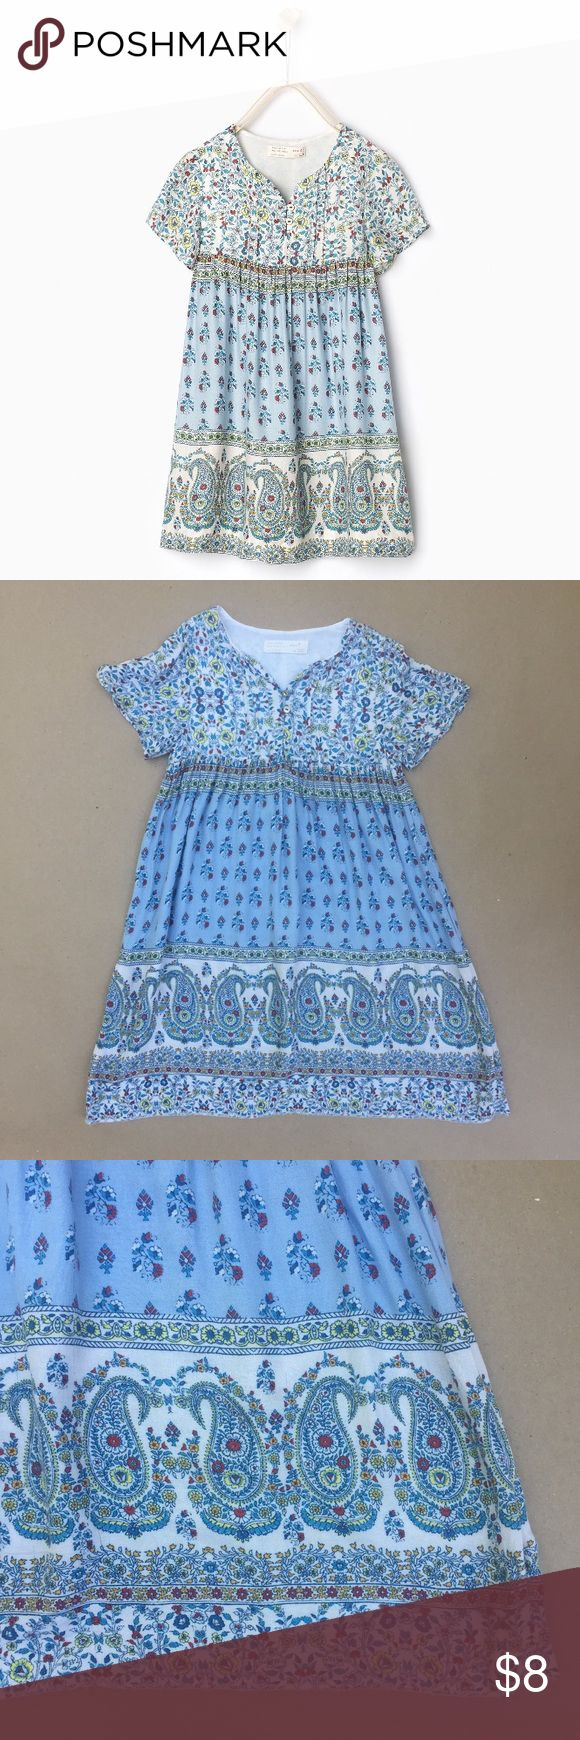 Zara girls dress Lightweight fabric, printed dress. Runs small, fits more like a 5/6. The hem was dropped for longer length. Zara Dresses Casual